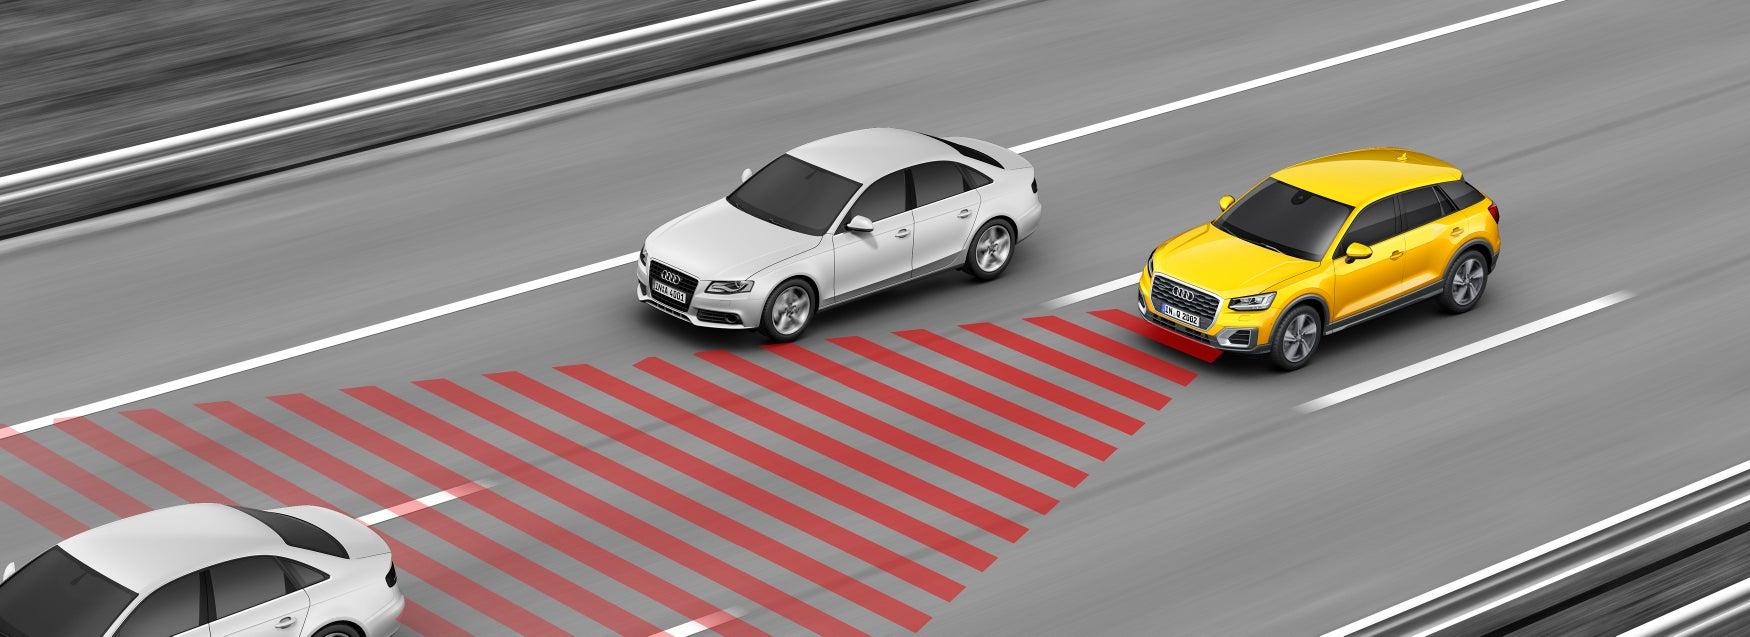 Audi Q2 adaptive cruise control